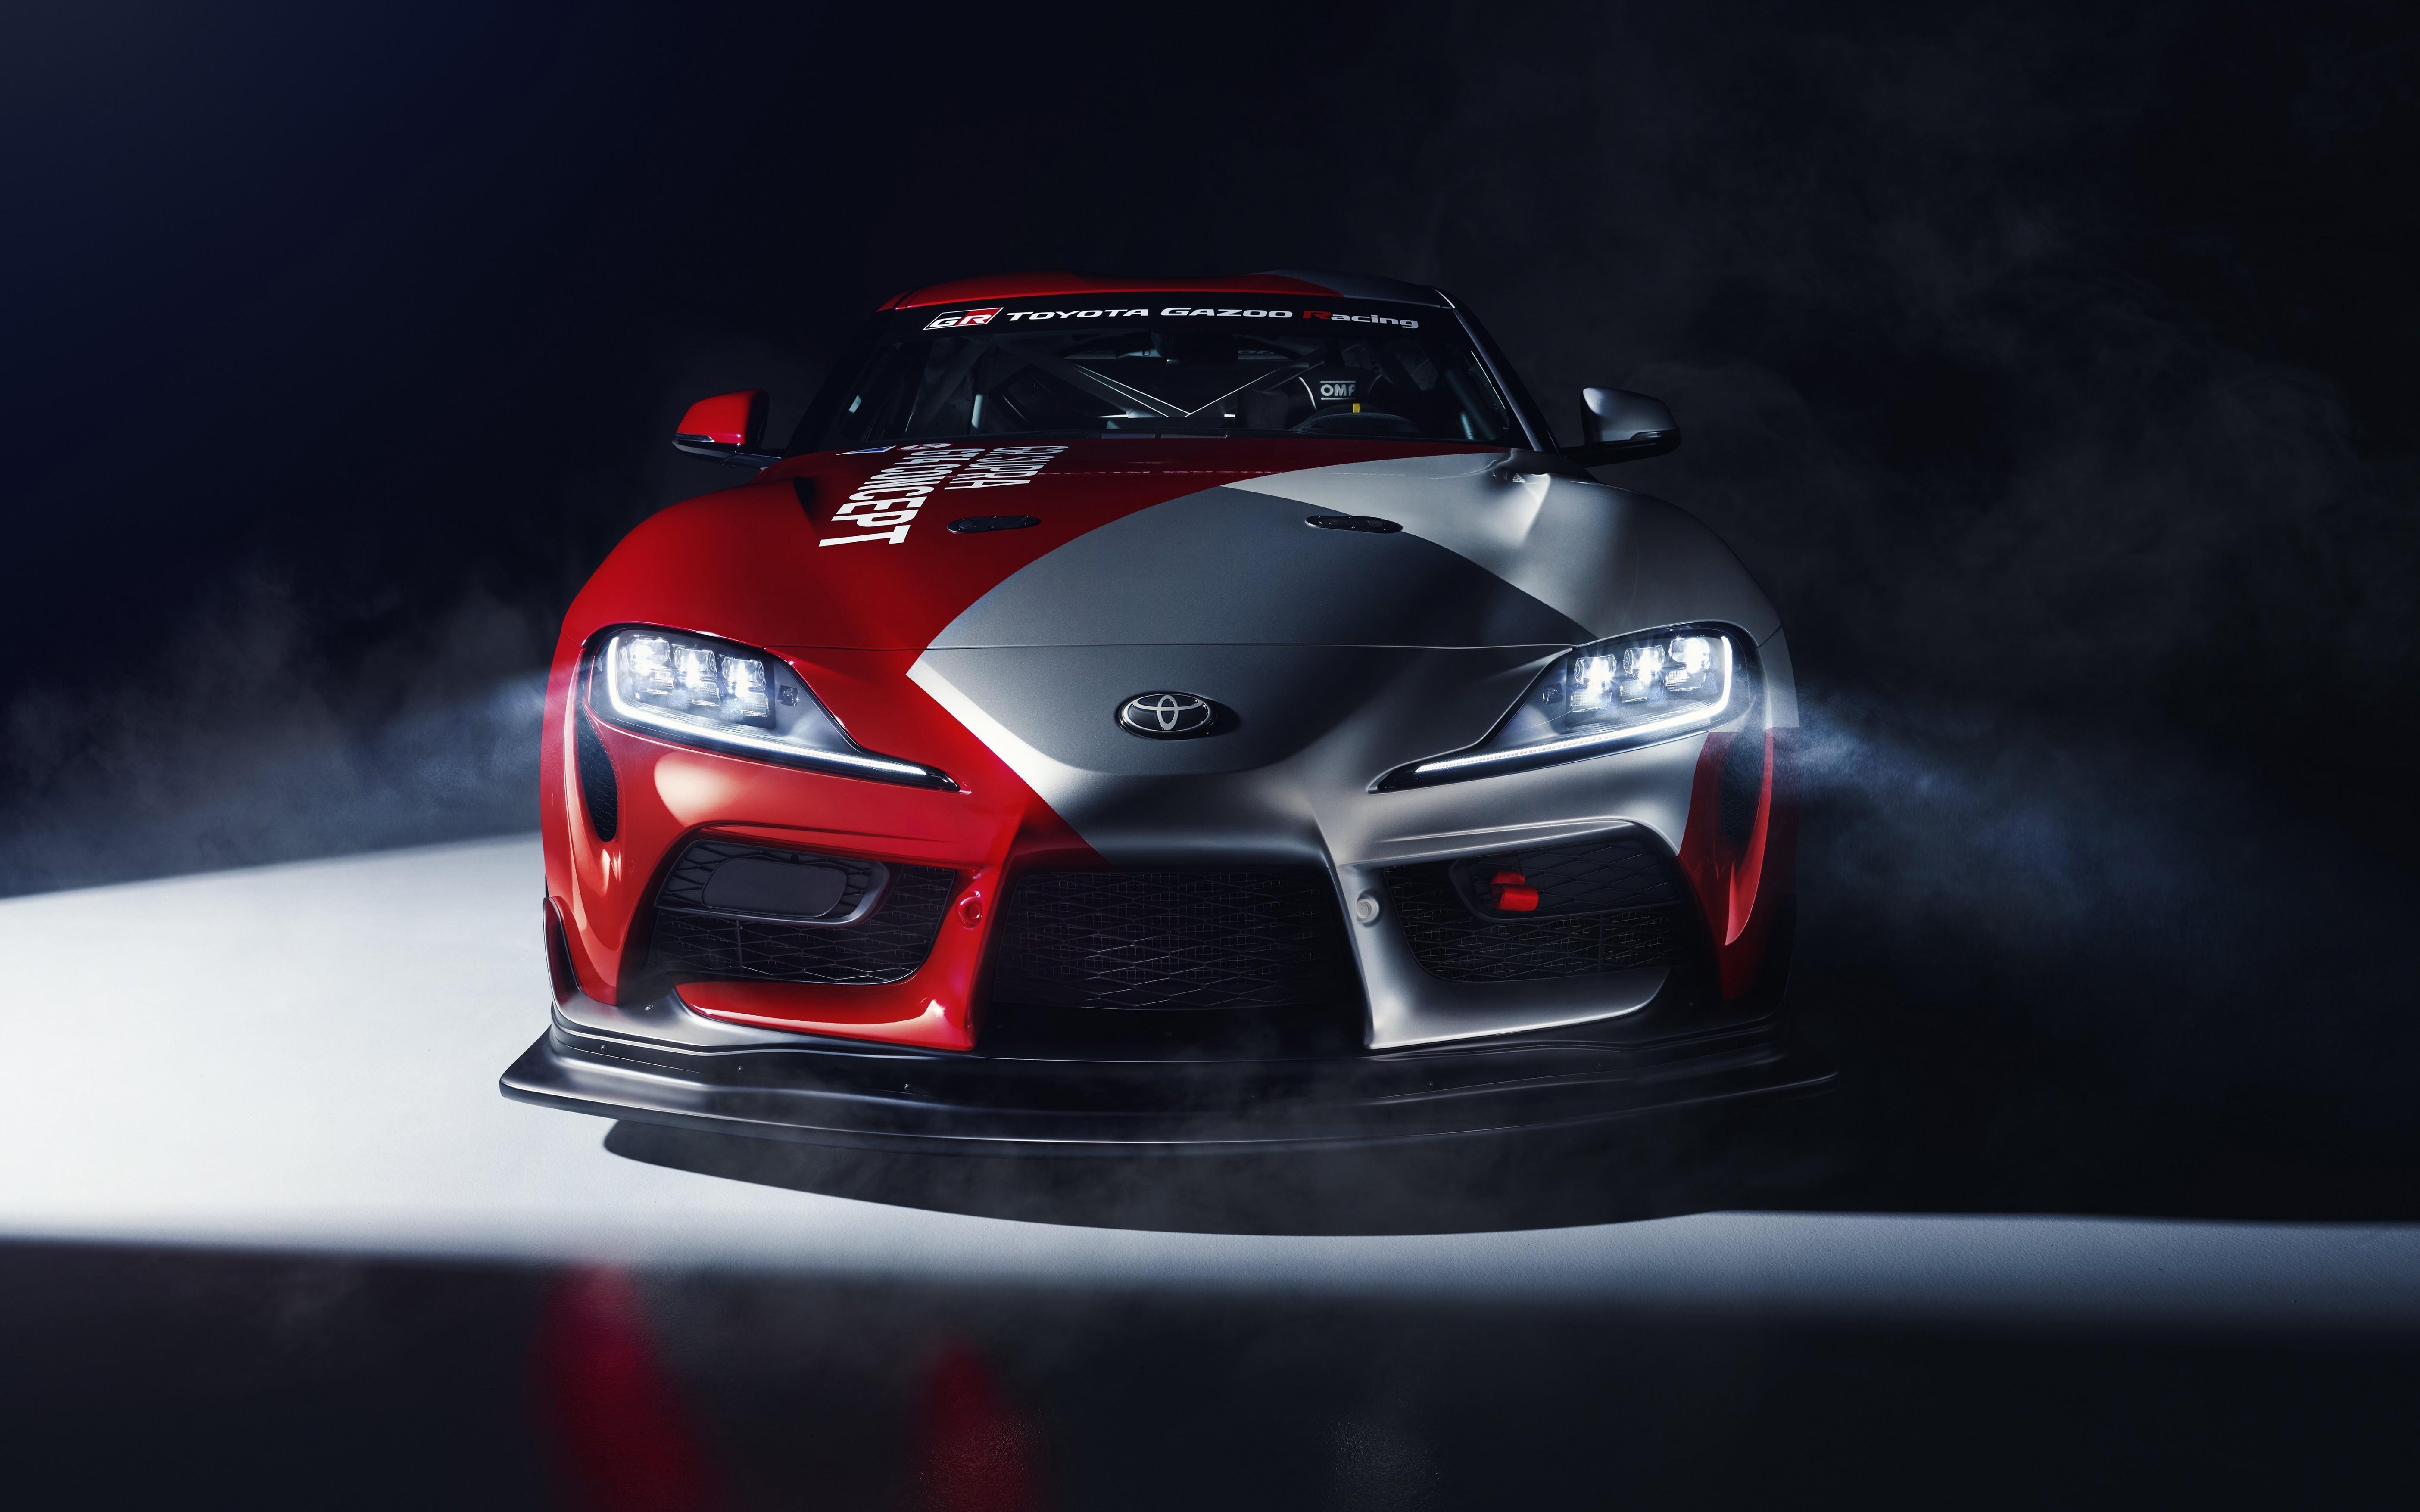 Download 5616x3510 Toyota Gr Supra Gt4 Racing Cars Concept 5616x3510